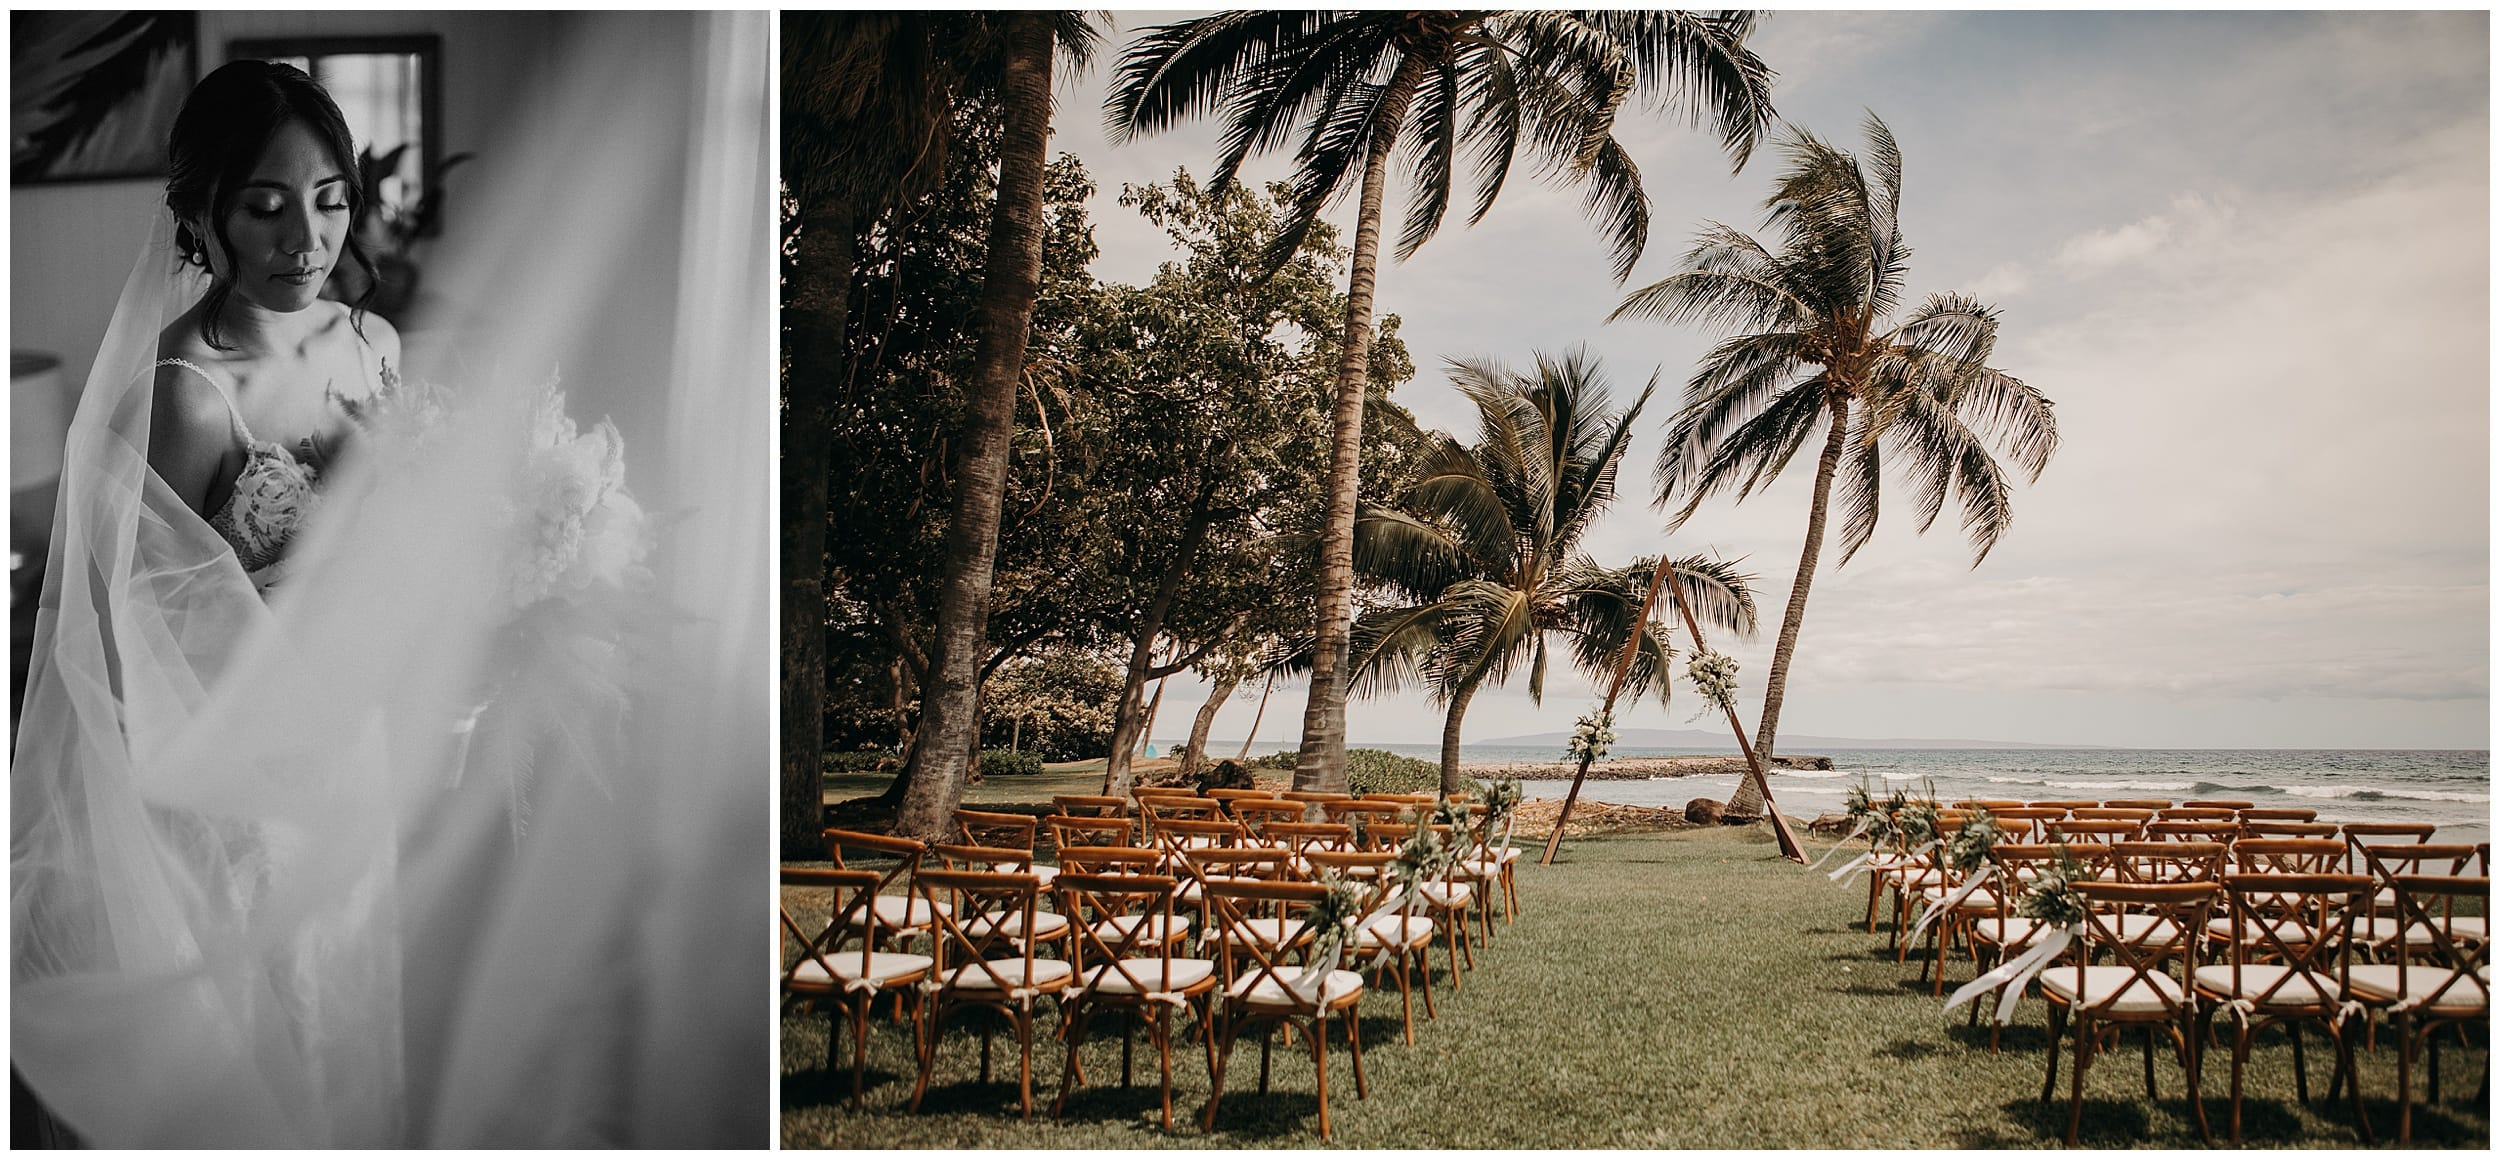 Maui wedding photography-10-11_0013